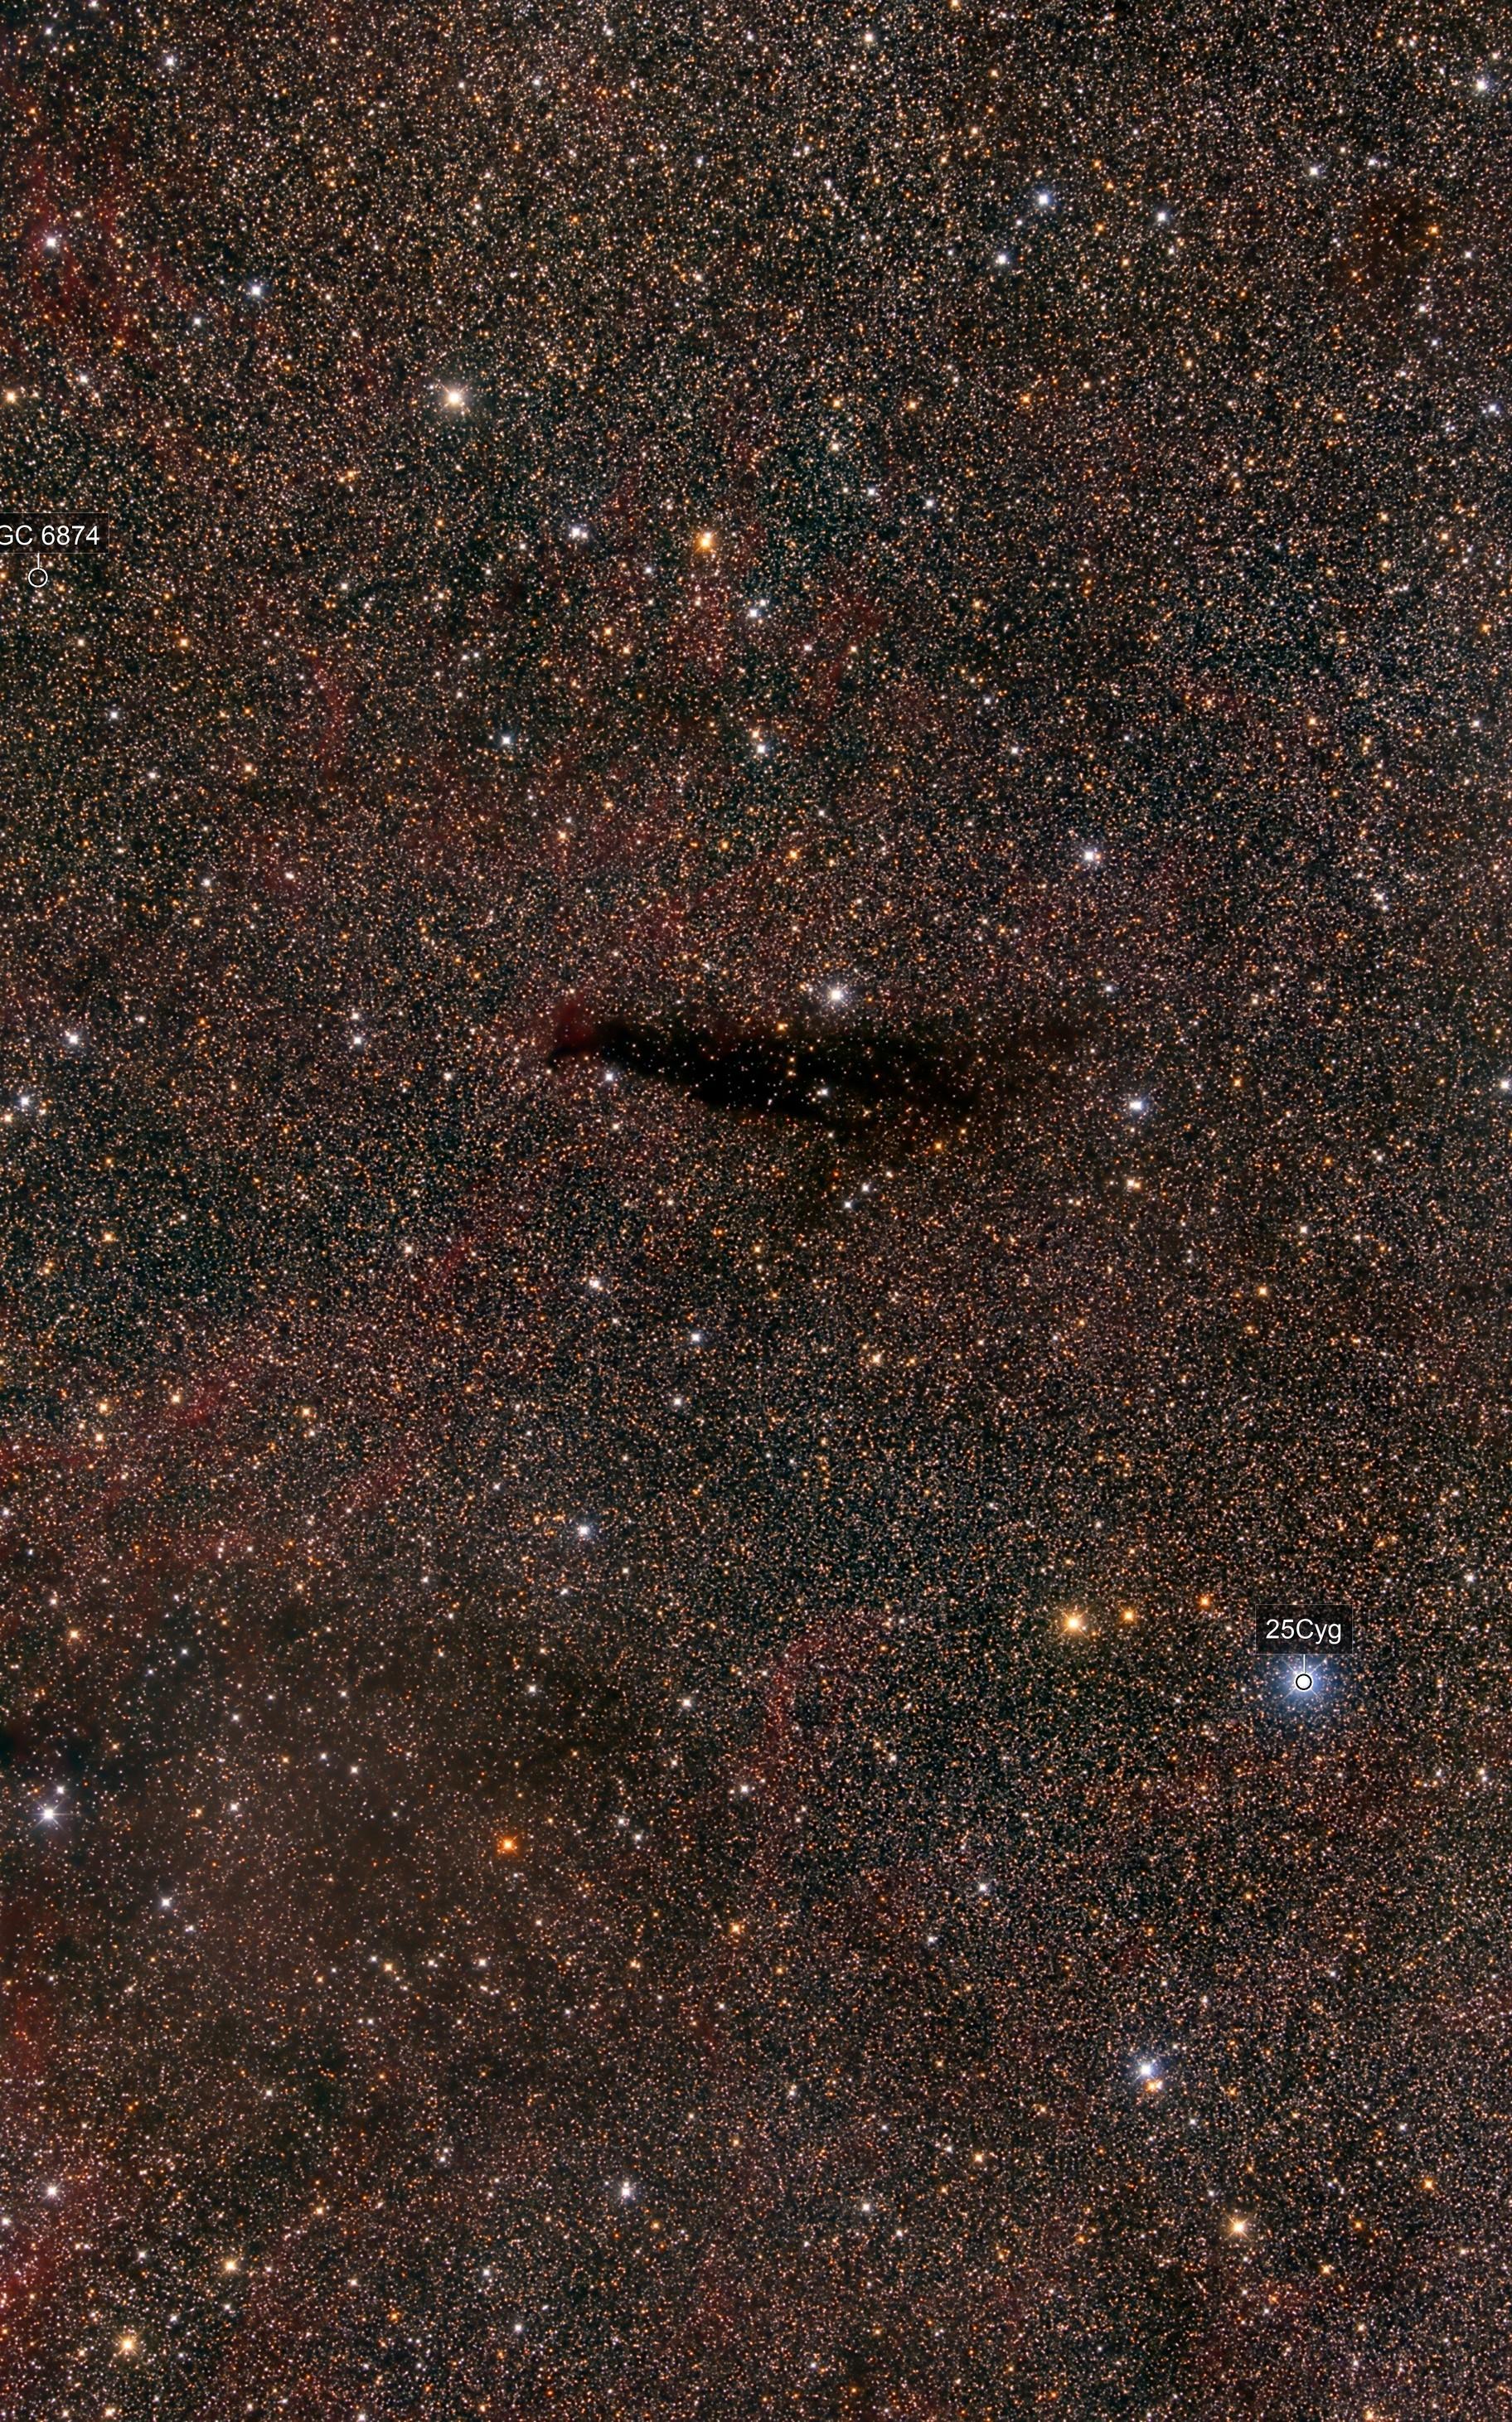 Barnard 145 dark nebula in Cygnus